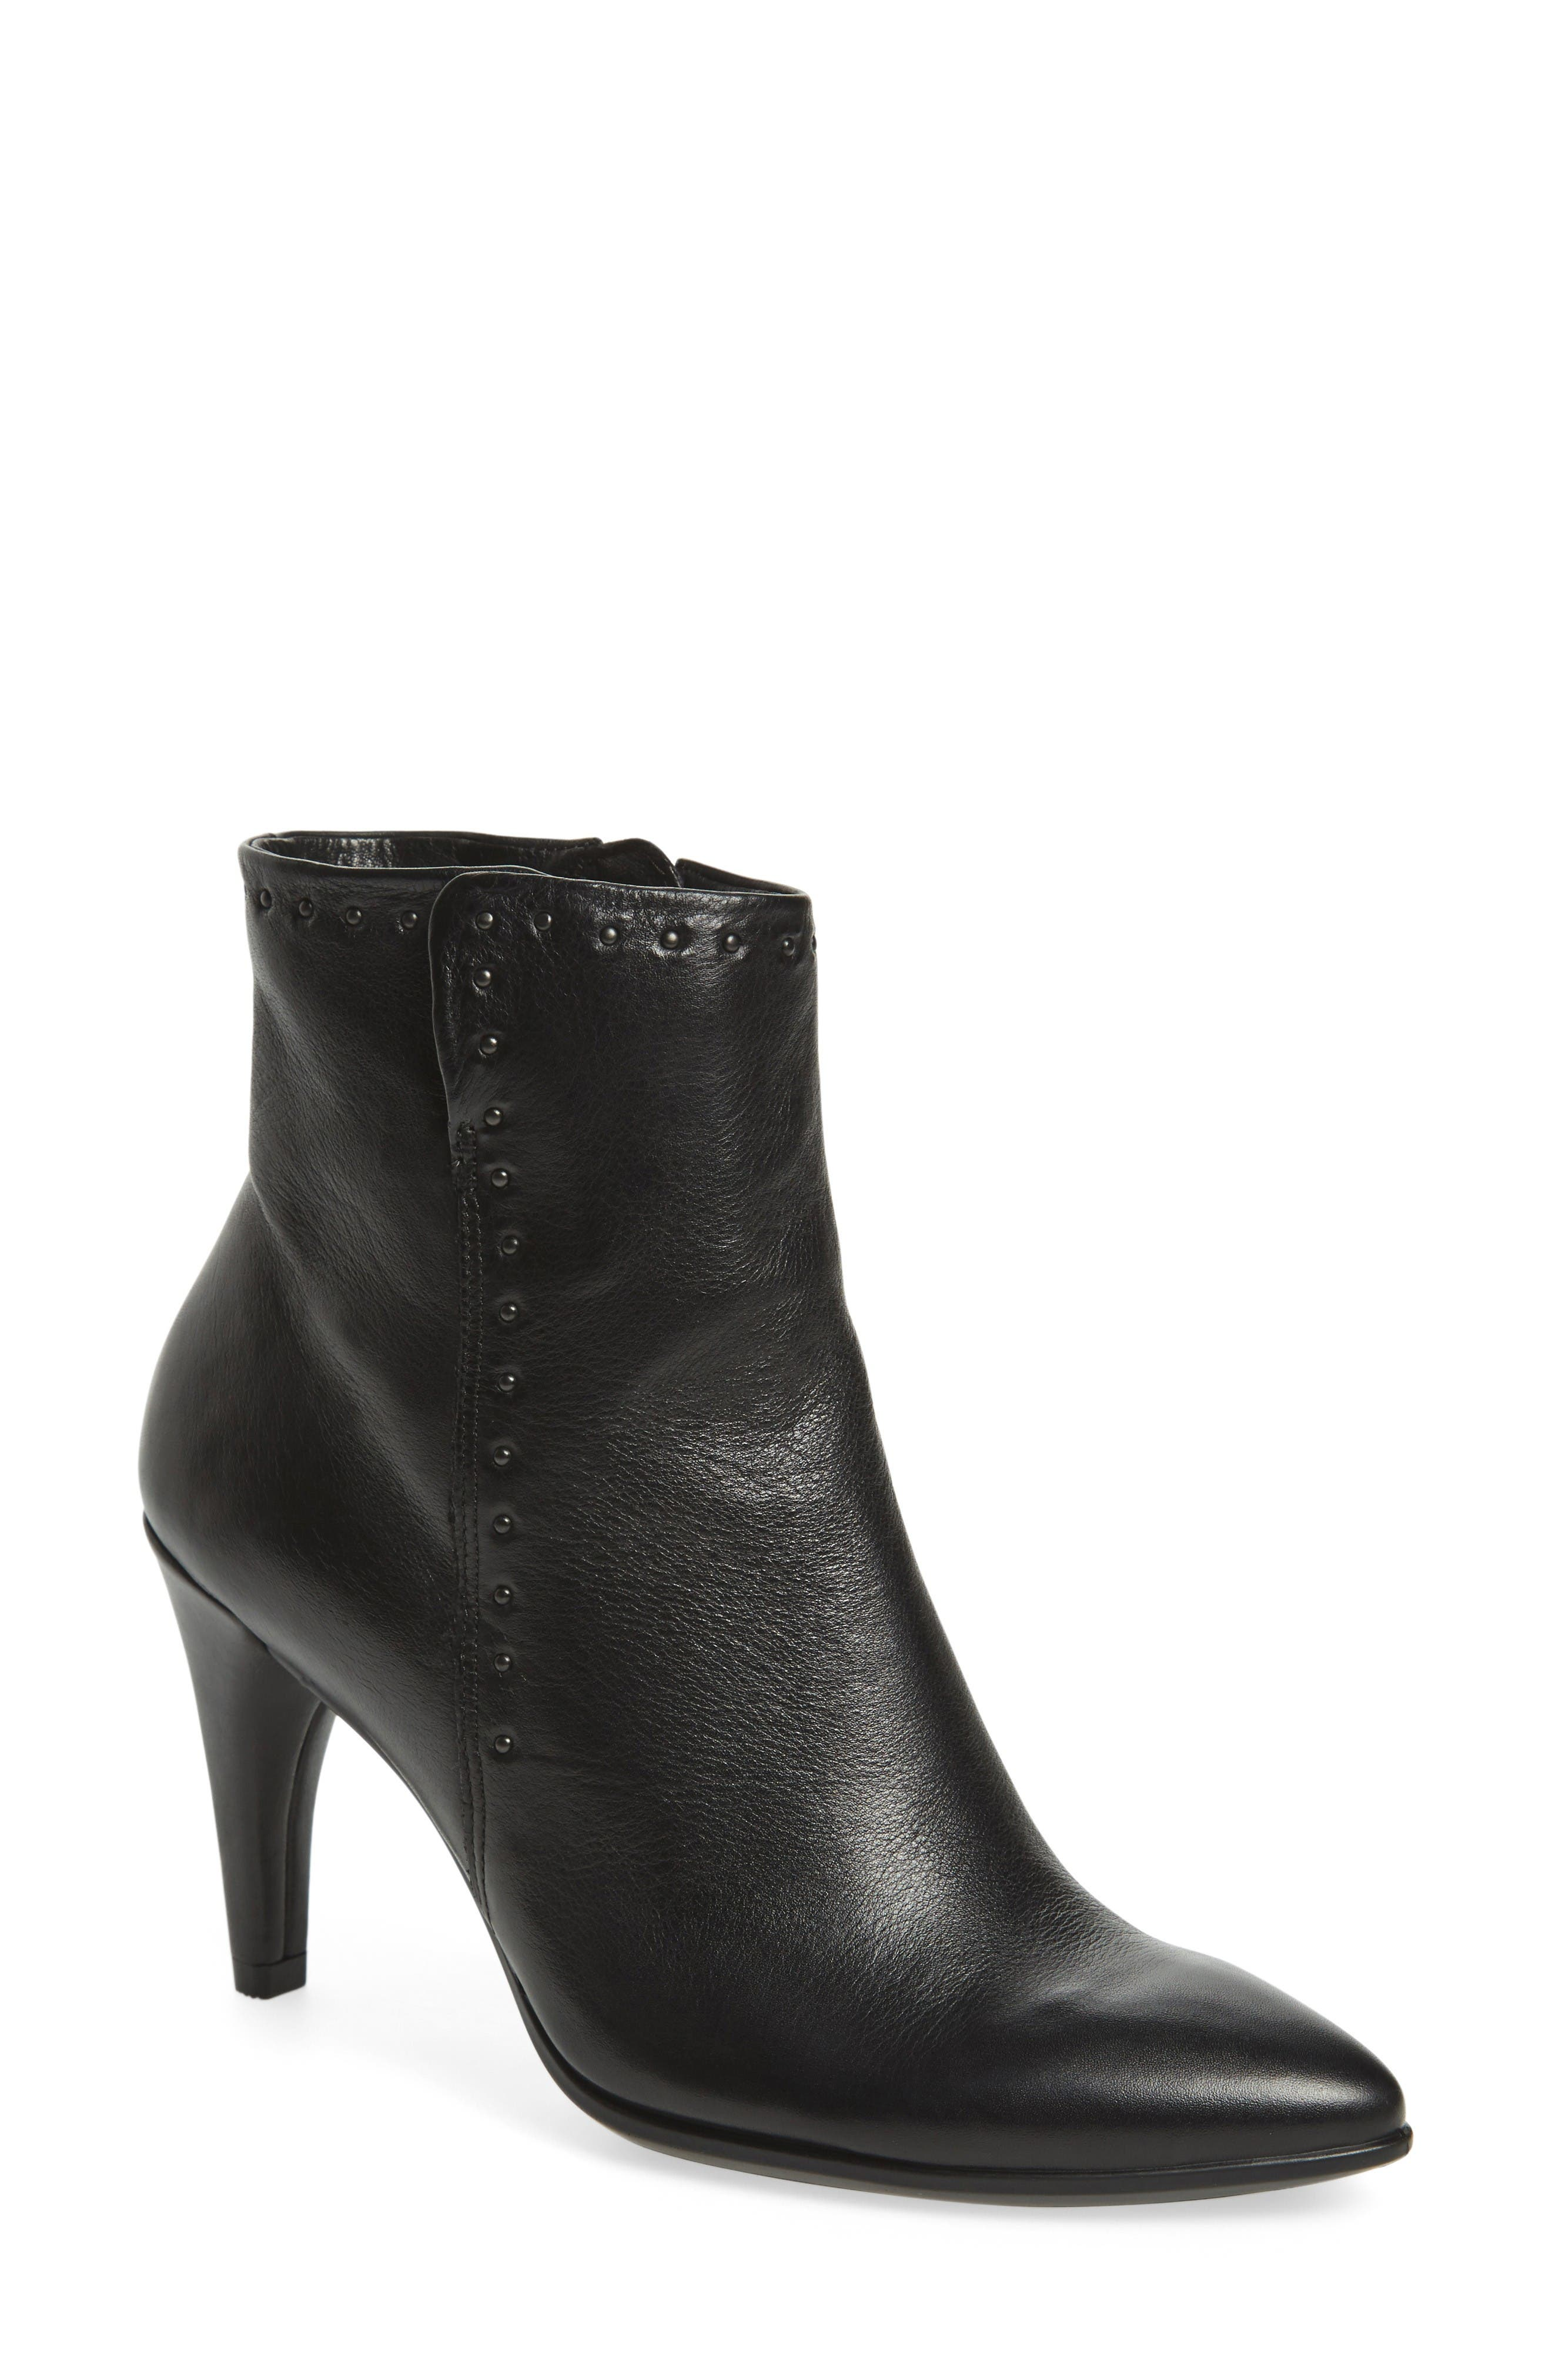 Alternate Image 1 Selected - ECCO Shape 75 Rivet Ankle Boot (Women)